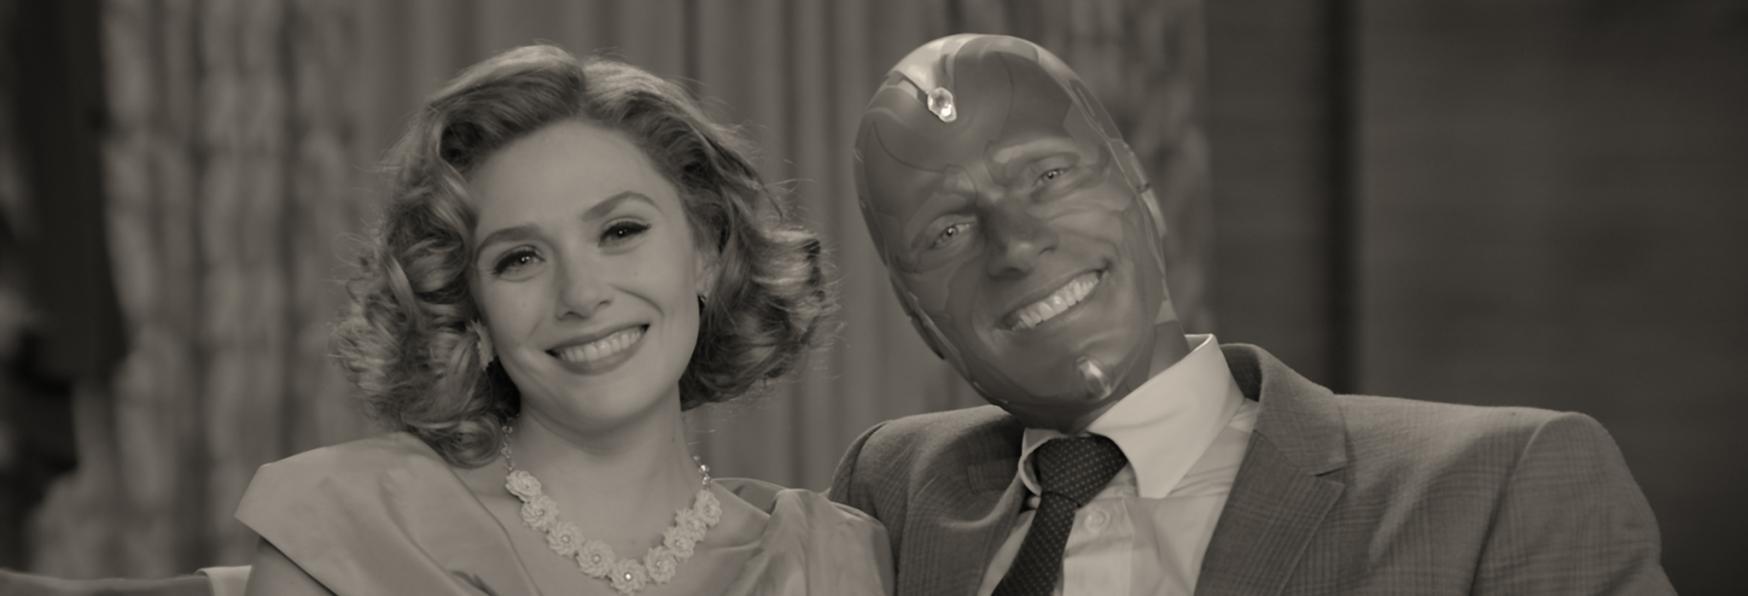 WandaVision: la Serie TV Marvel sarà ambientata dopo Avengers: Endgame